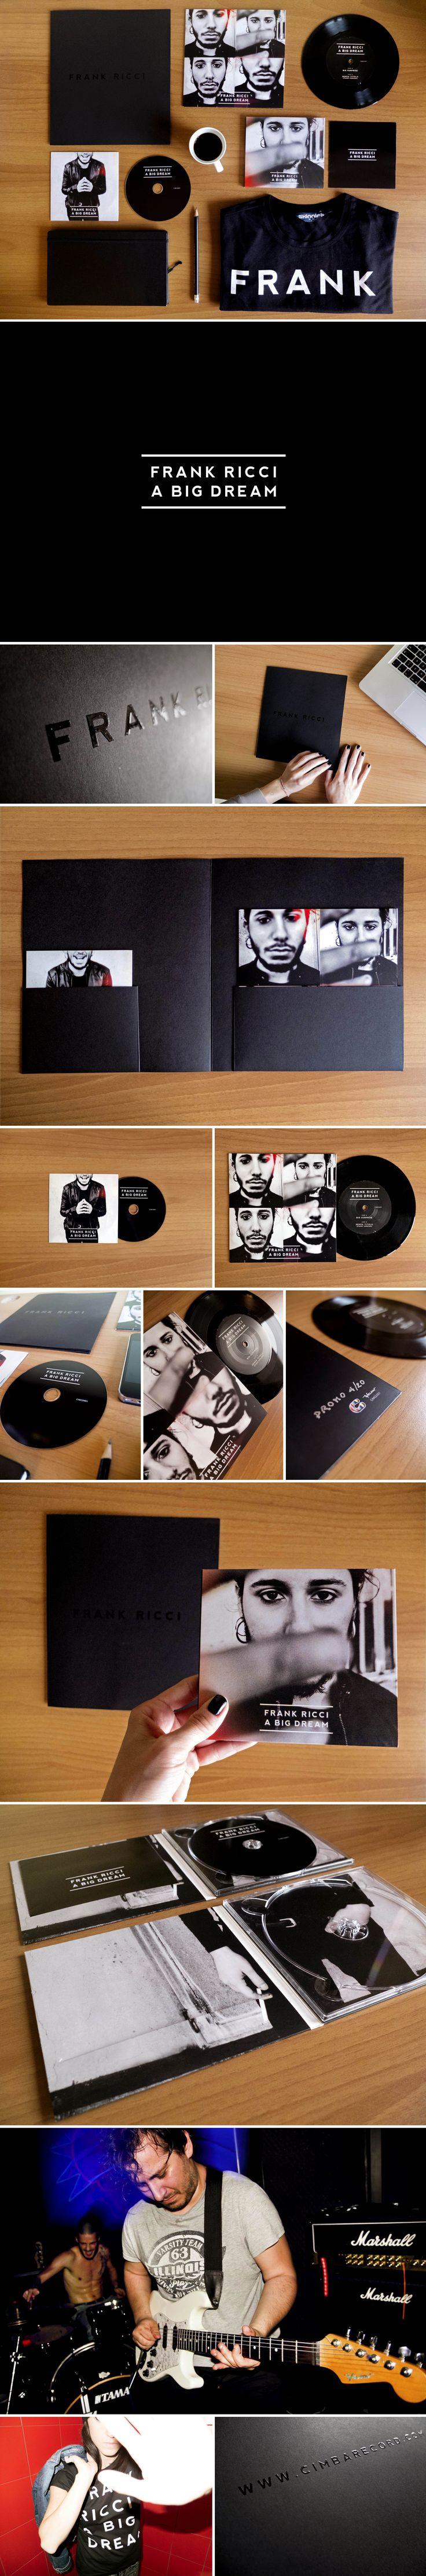 "FRANK RICCI - A BIG DREAM Vinyl 7"", CD and Limited Edition CD  Artwork Roberta Menghi Photo Henry Ruggeri Product by Cimbarecord"